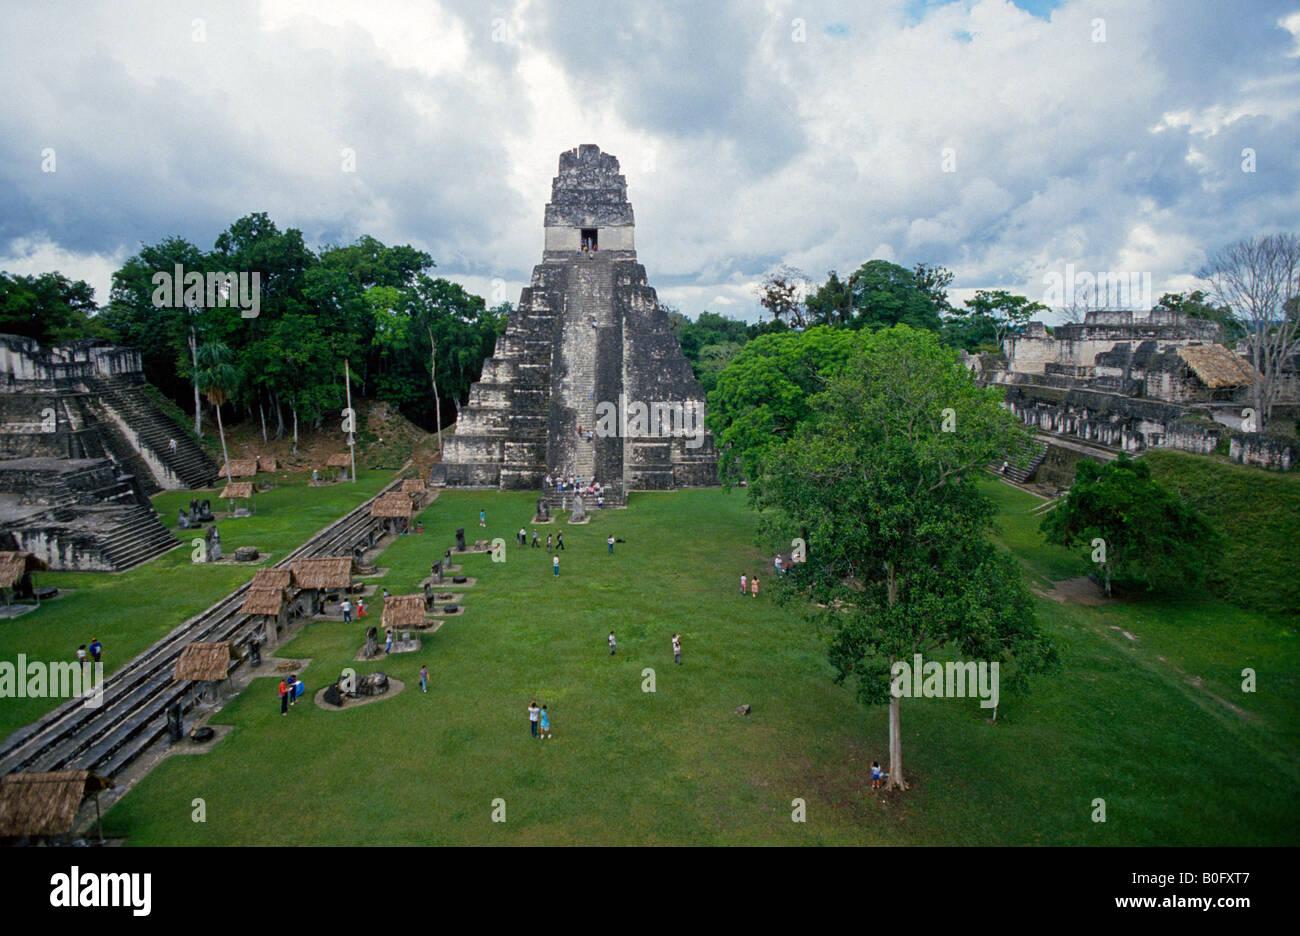 A view of the main pyramid or temple at Tikal Mayan ruins in the highlands of Guatemala Tikal was a major city of - Stock Image